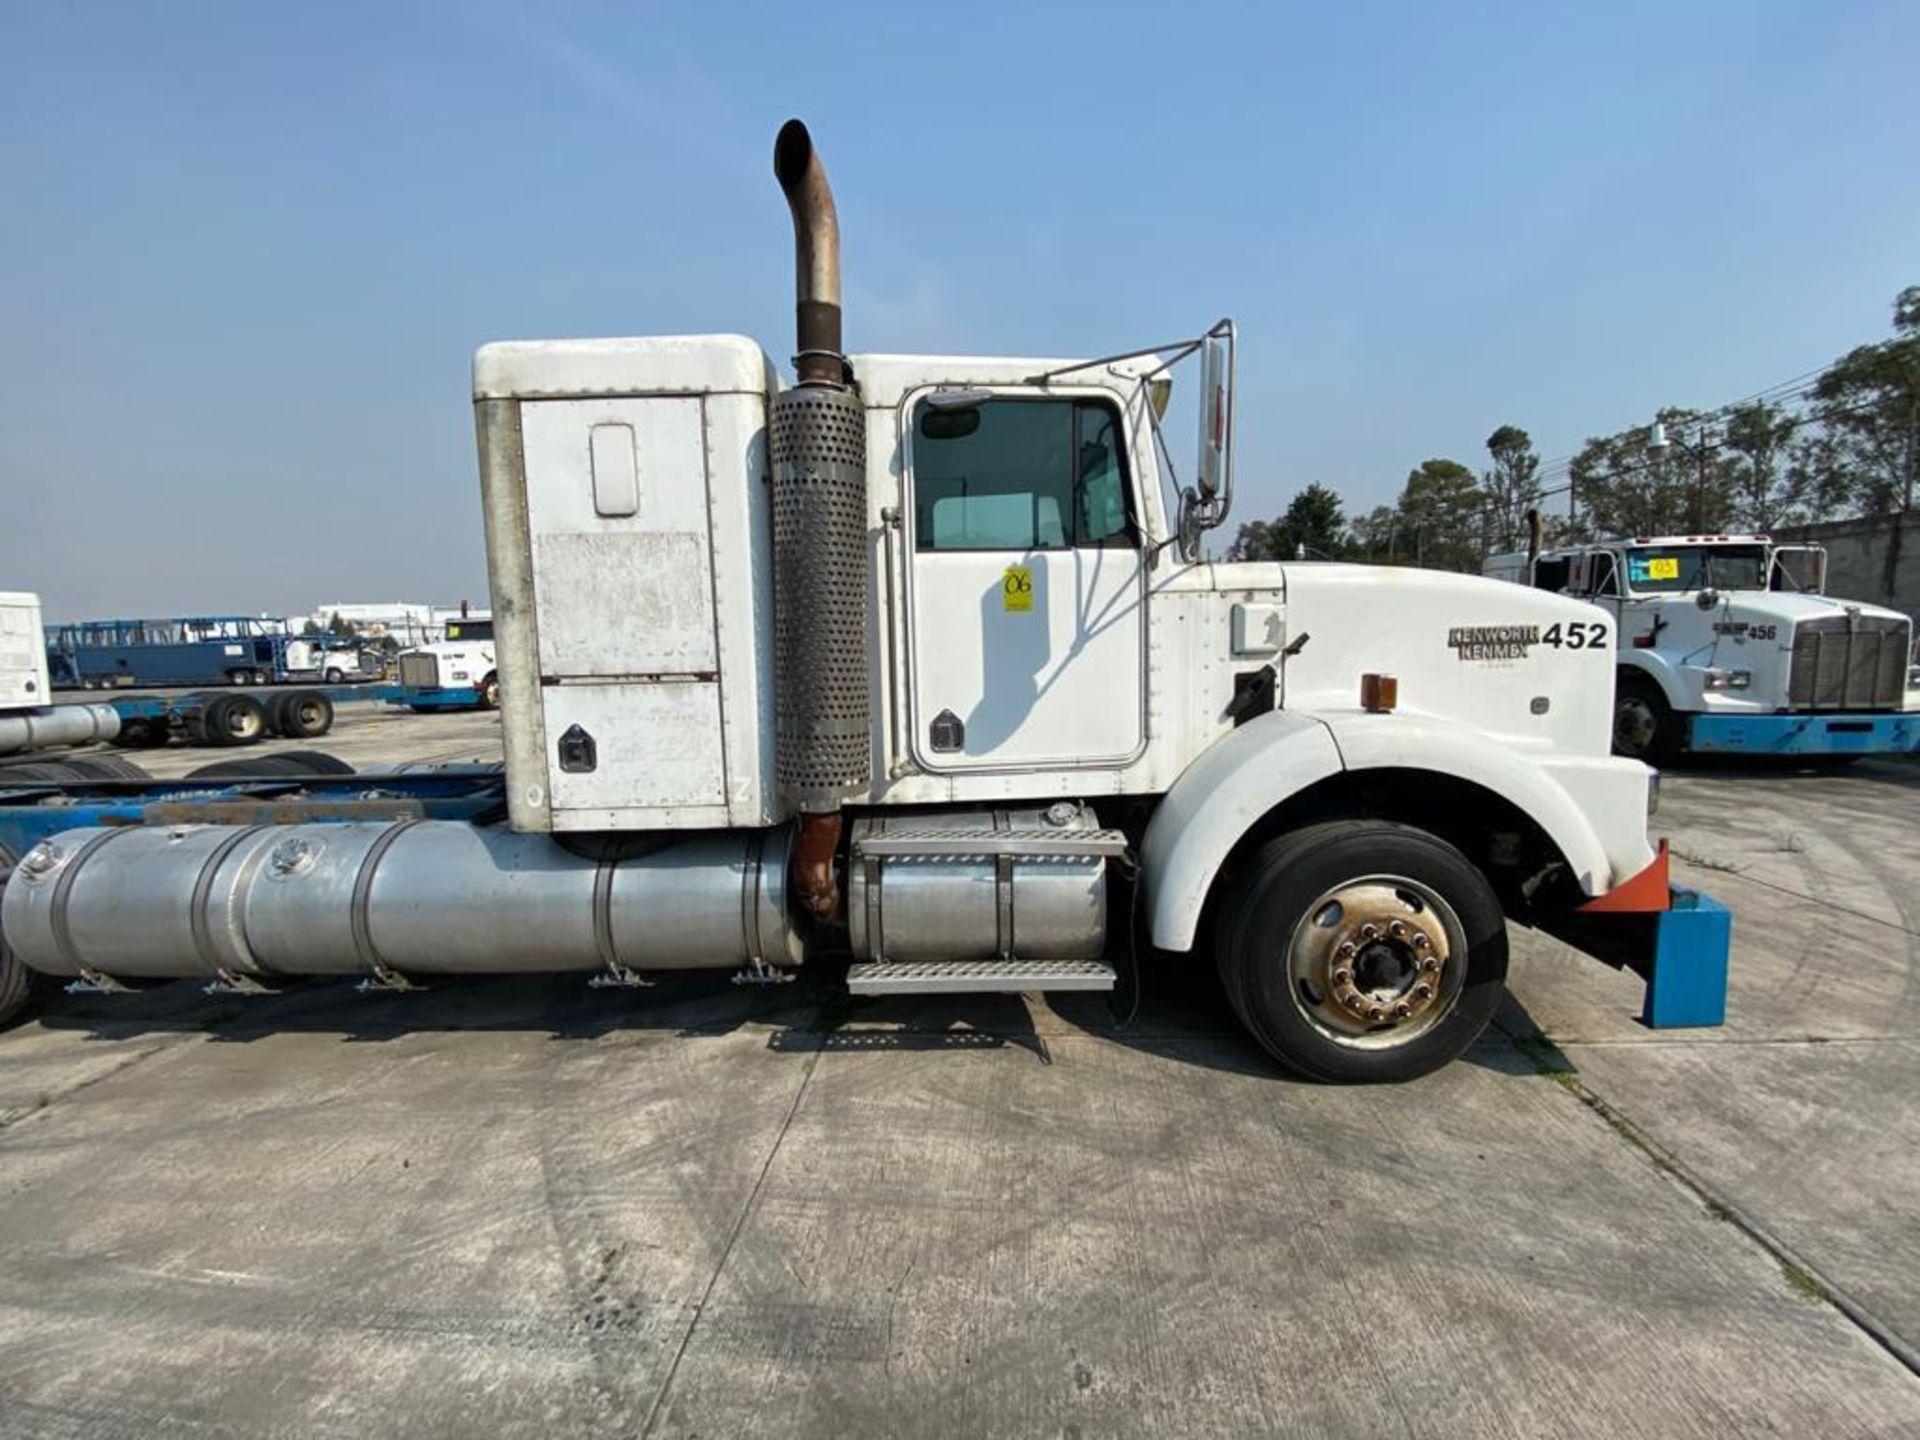 1998 Kenworth Sleeper truck tractor, standard transmission of 18 speeds - Image 27 of 75